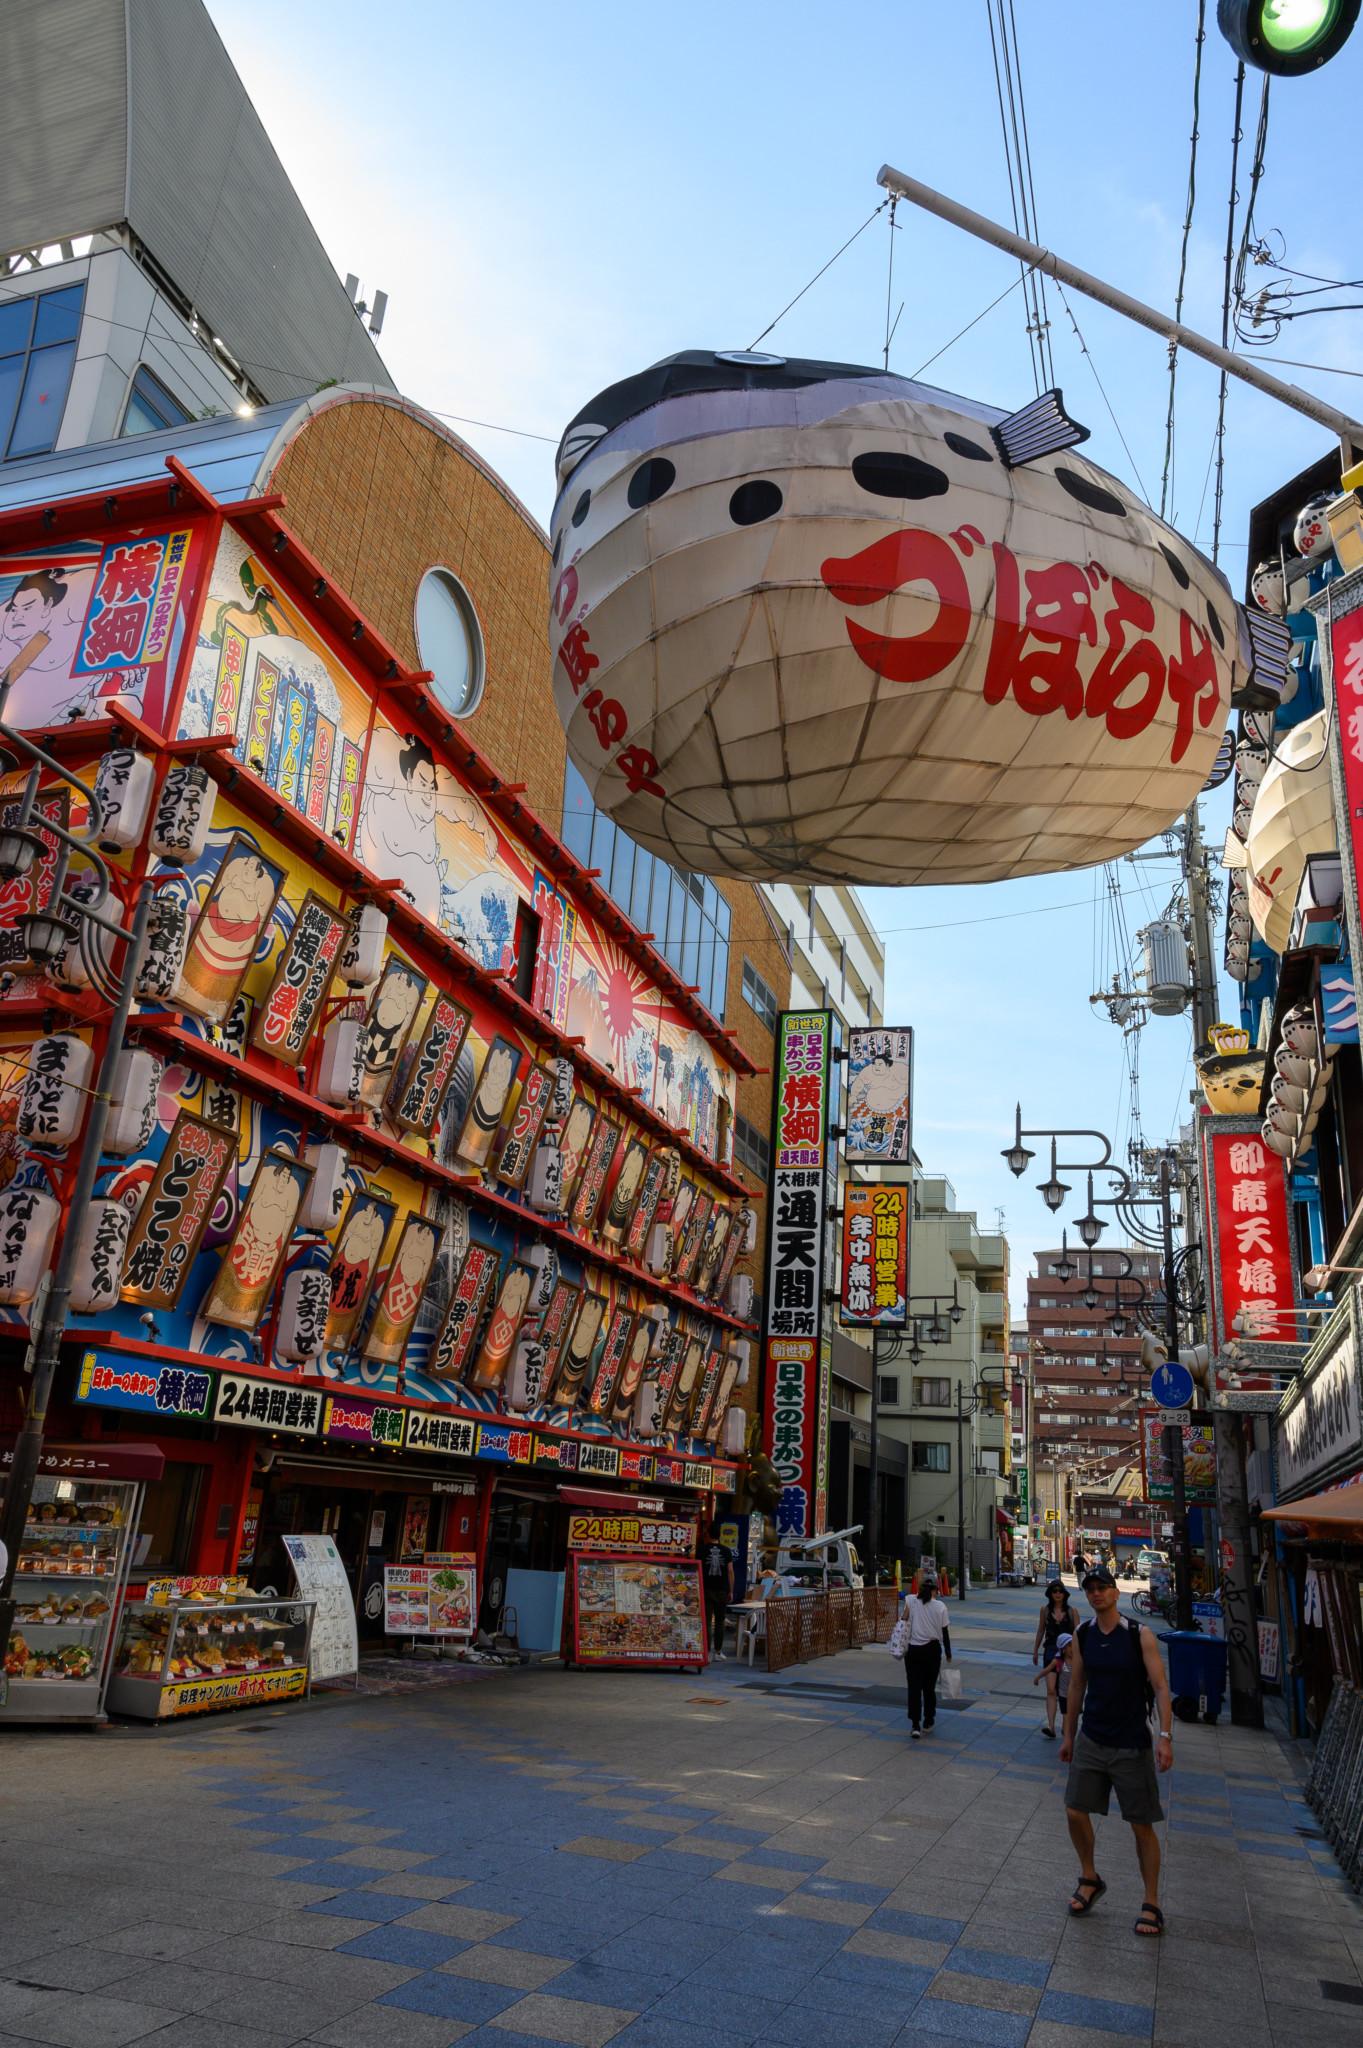 Straße im Bezirk Shinsekai in Osaka, Japan